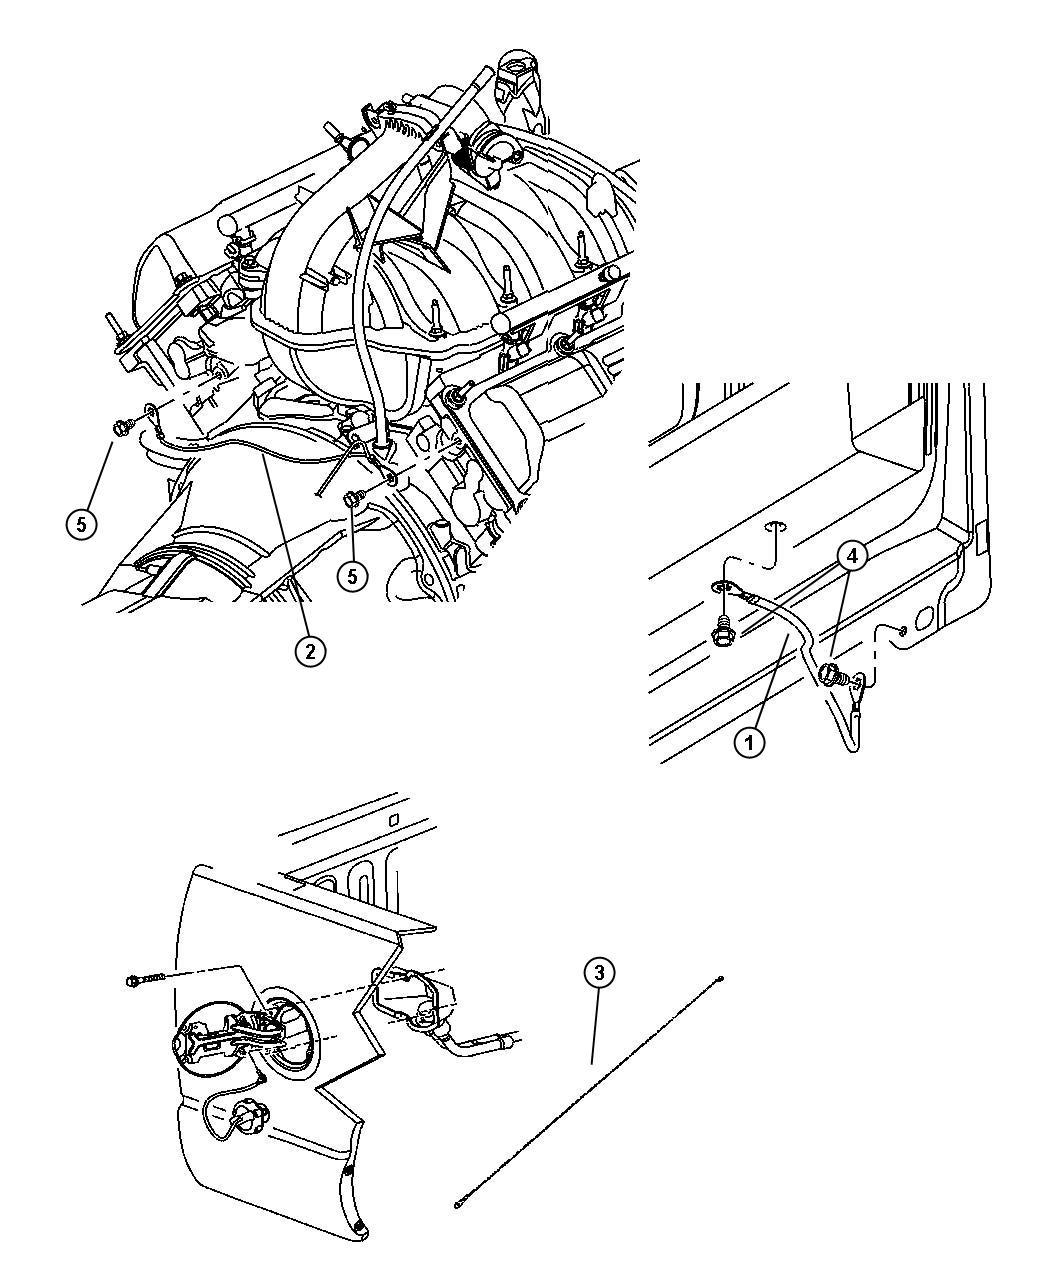 Dodge Ram Blower Parts Diagram